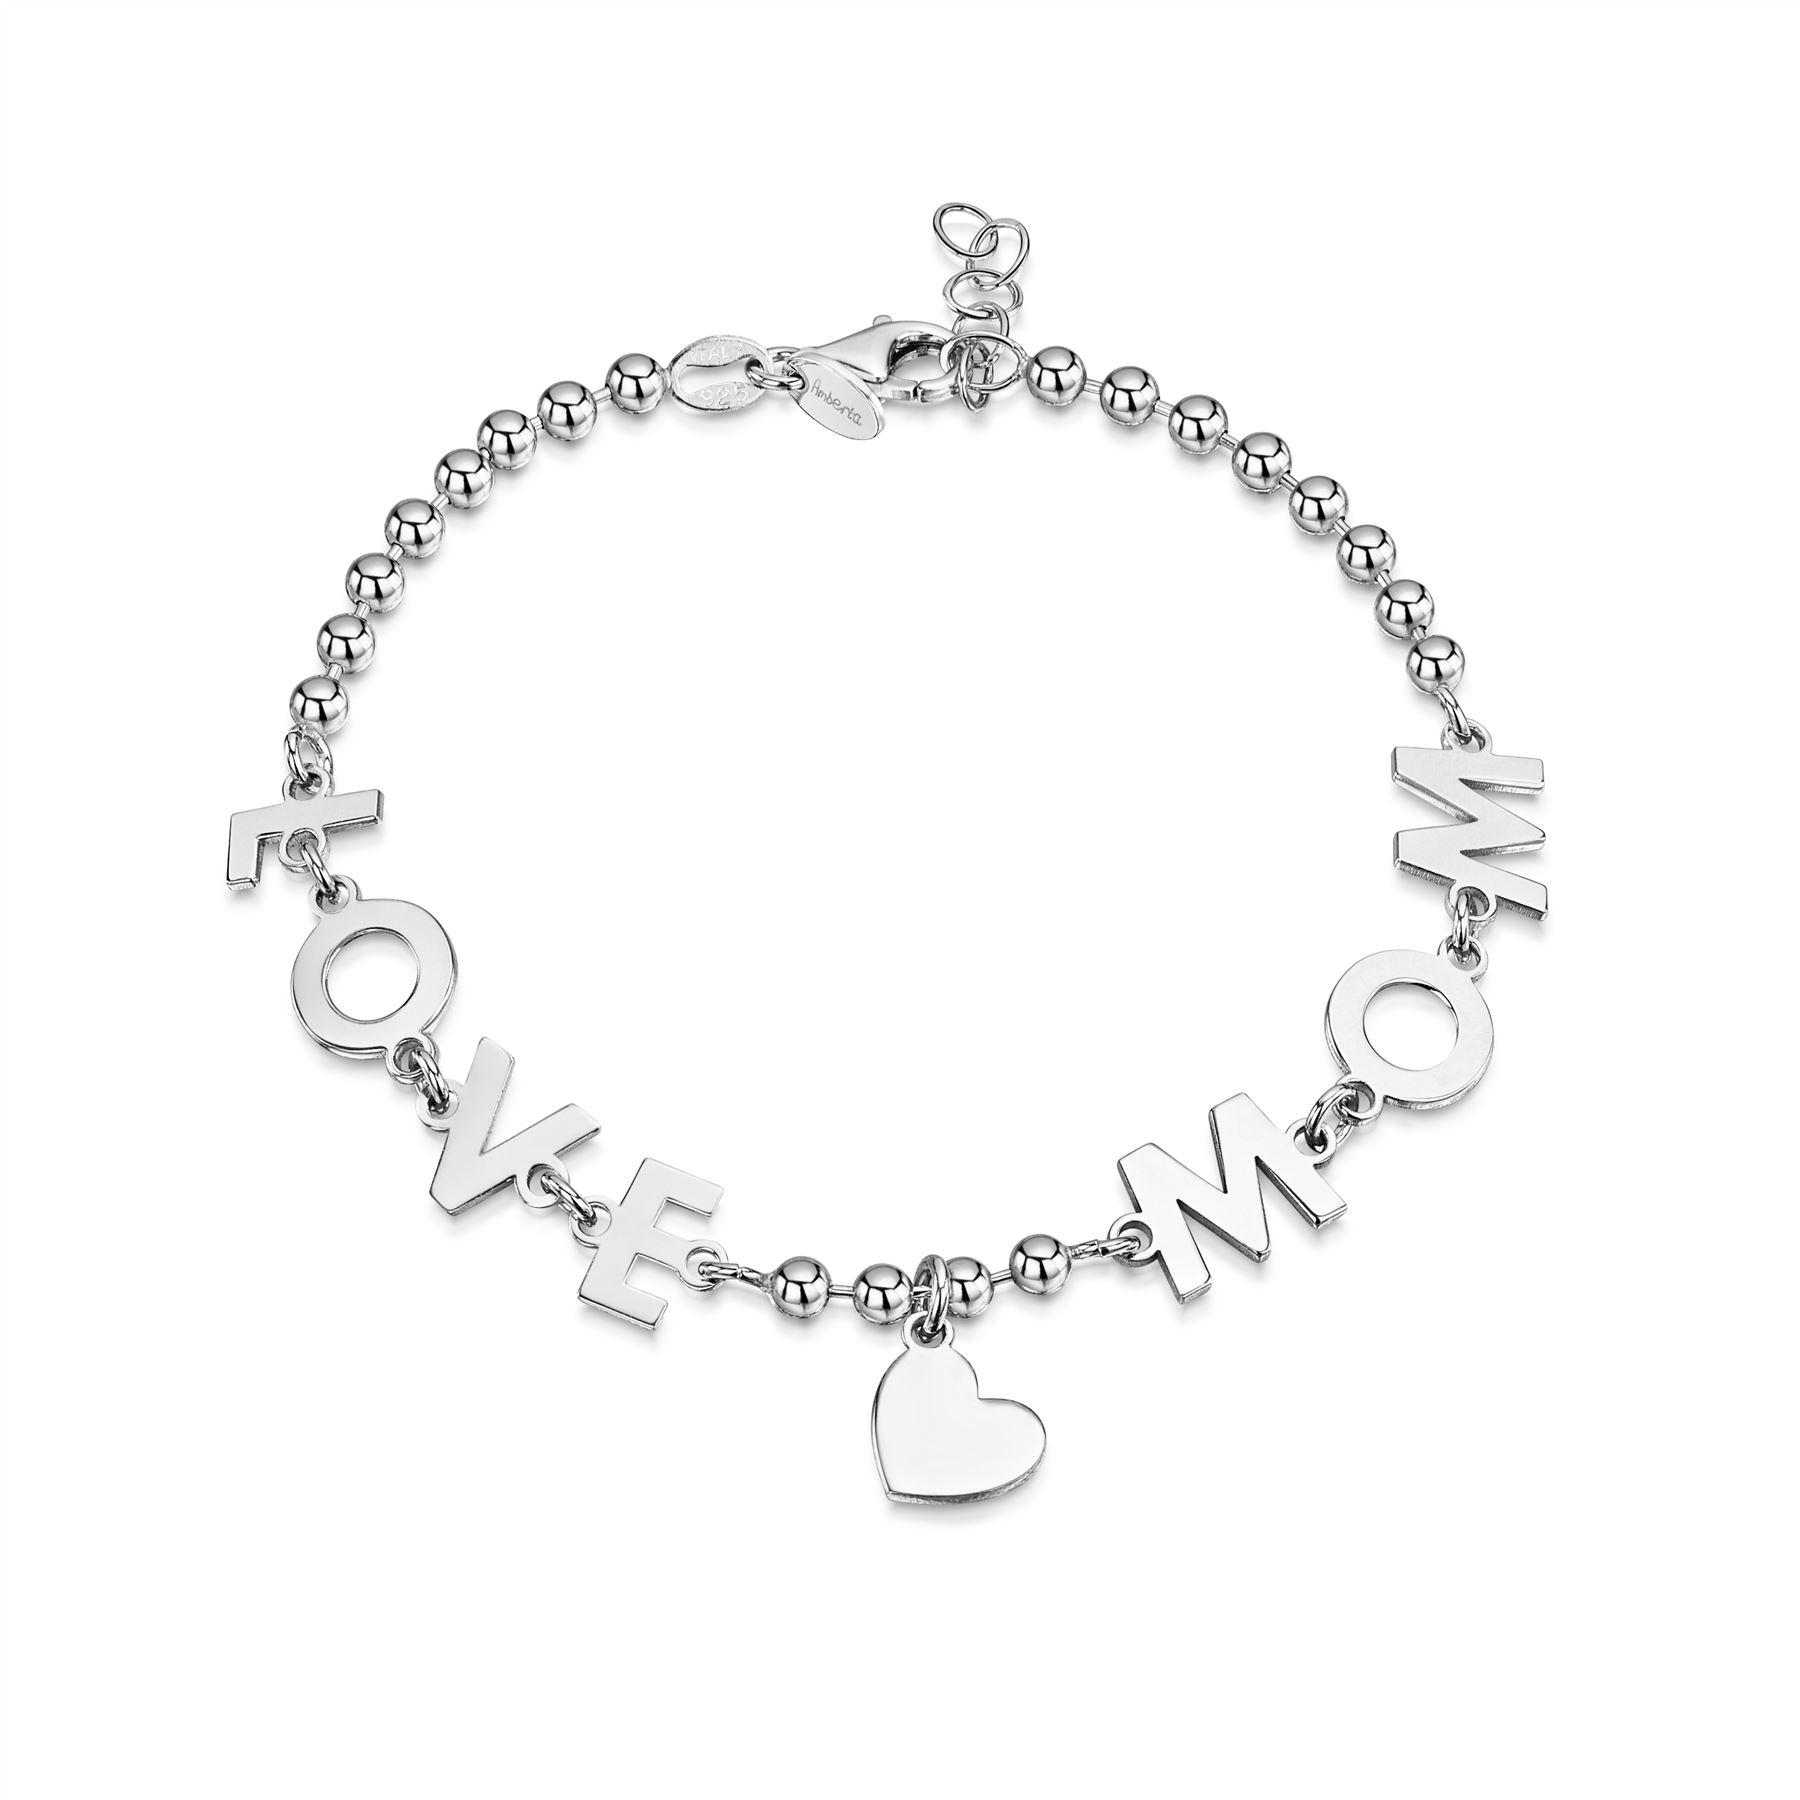 Amberta-Jewelry-925-Sterling-Silver-Adjustable-Bracelet-Italian-Bangle-for-Women miniature 81